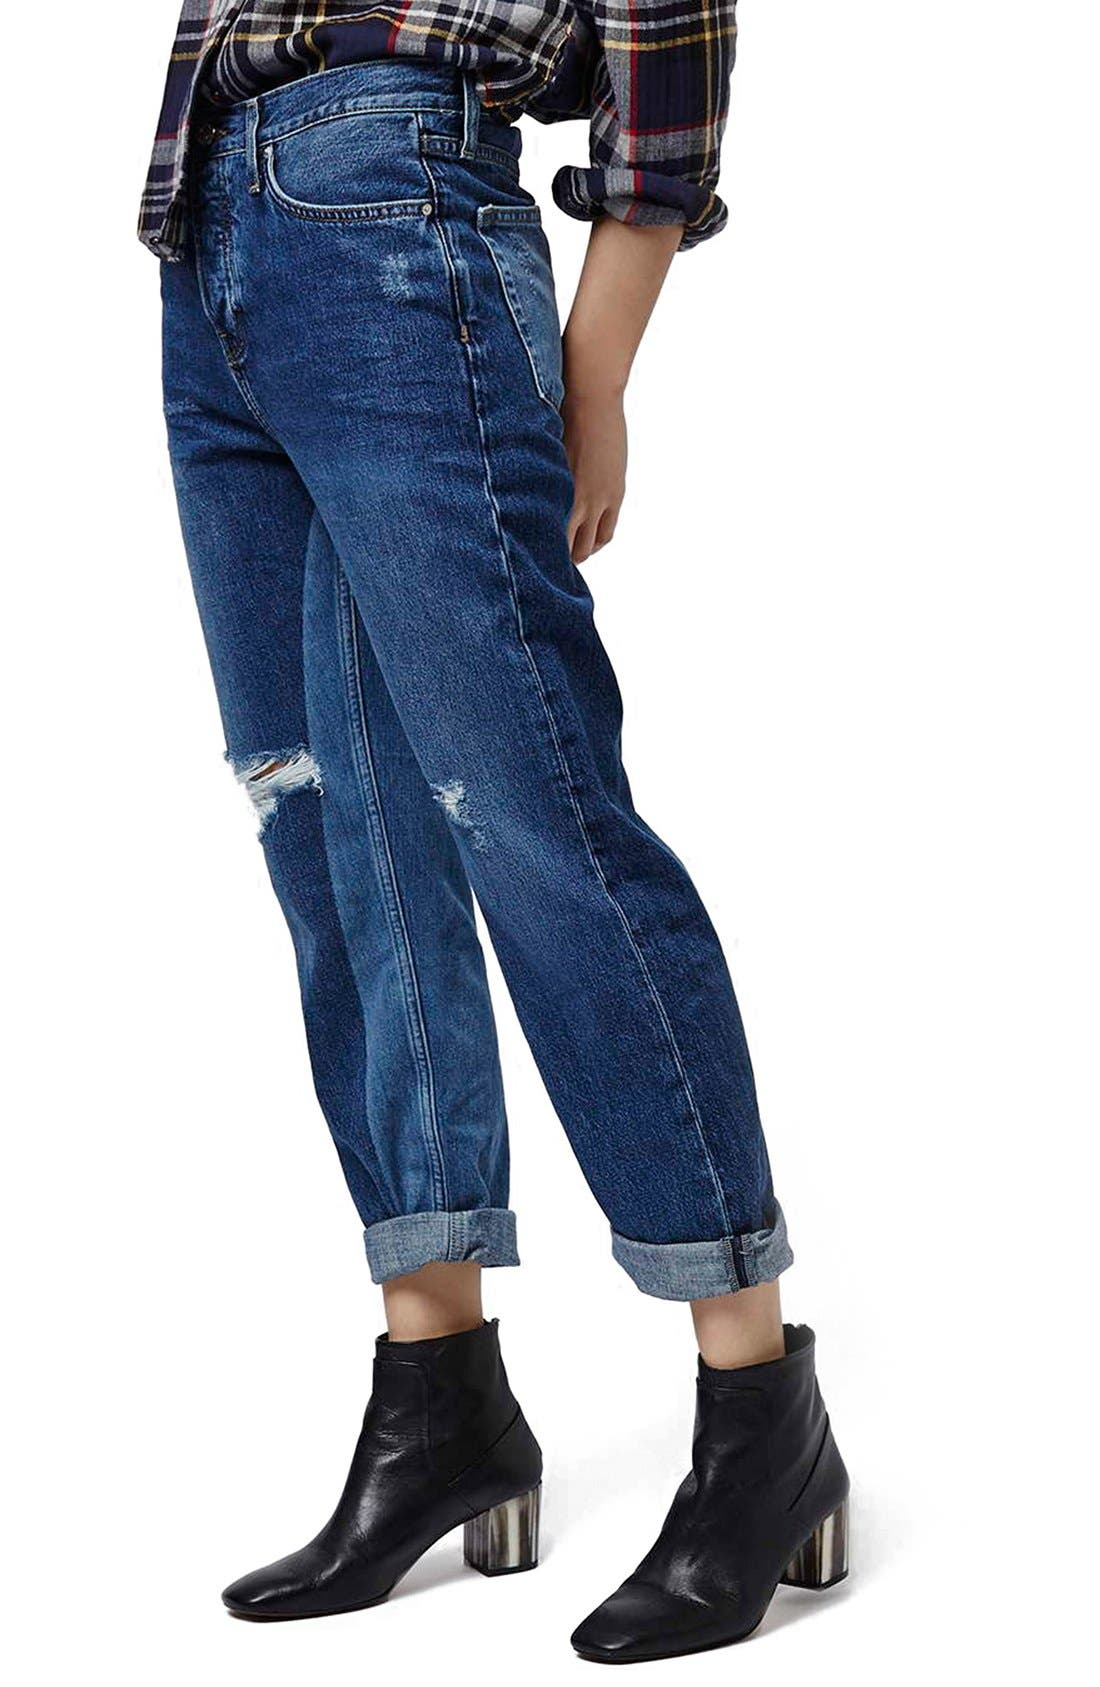 Main Image - Topshop 'Patch' Two Tone High Rise Boyfriend Jeans